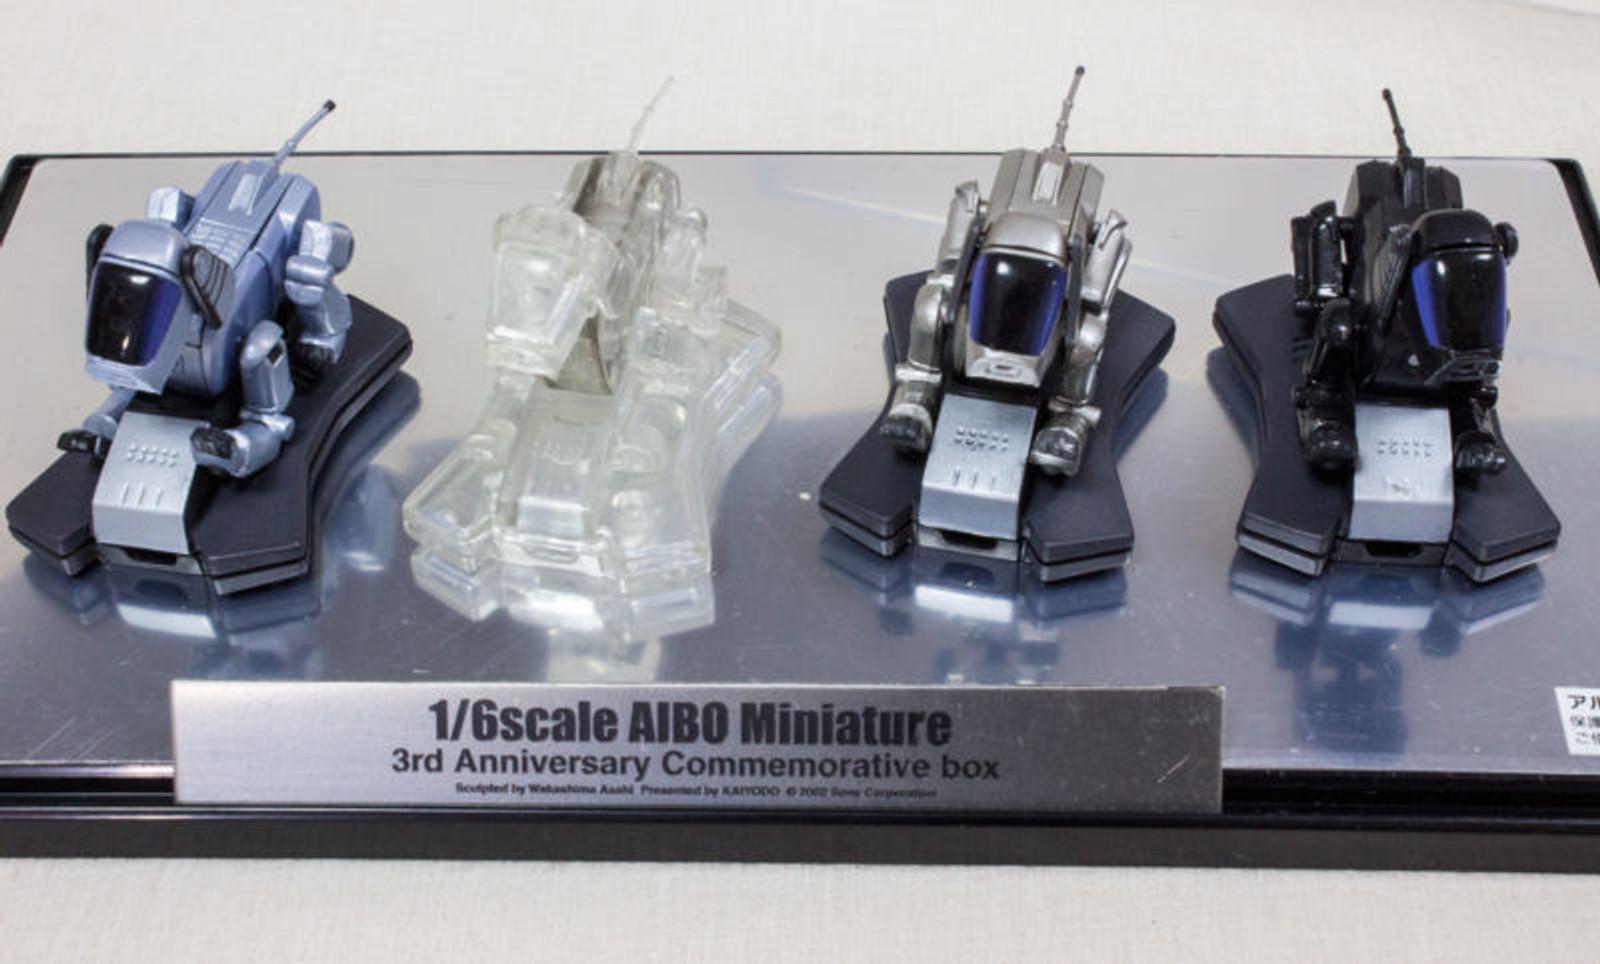 AIBO 1/6 Scale Miniature Figure 3rd Annniversaru Commemorative Box Kaiyodo JAPAN